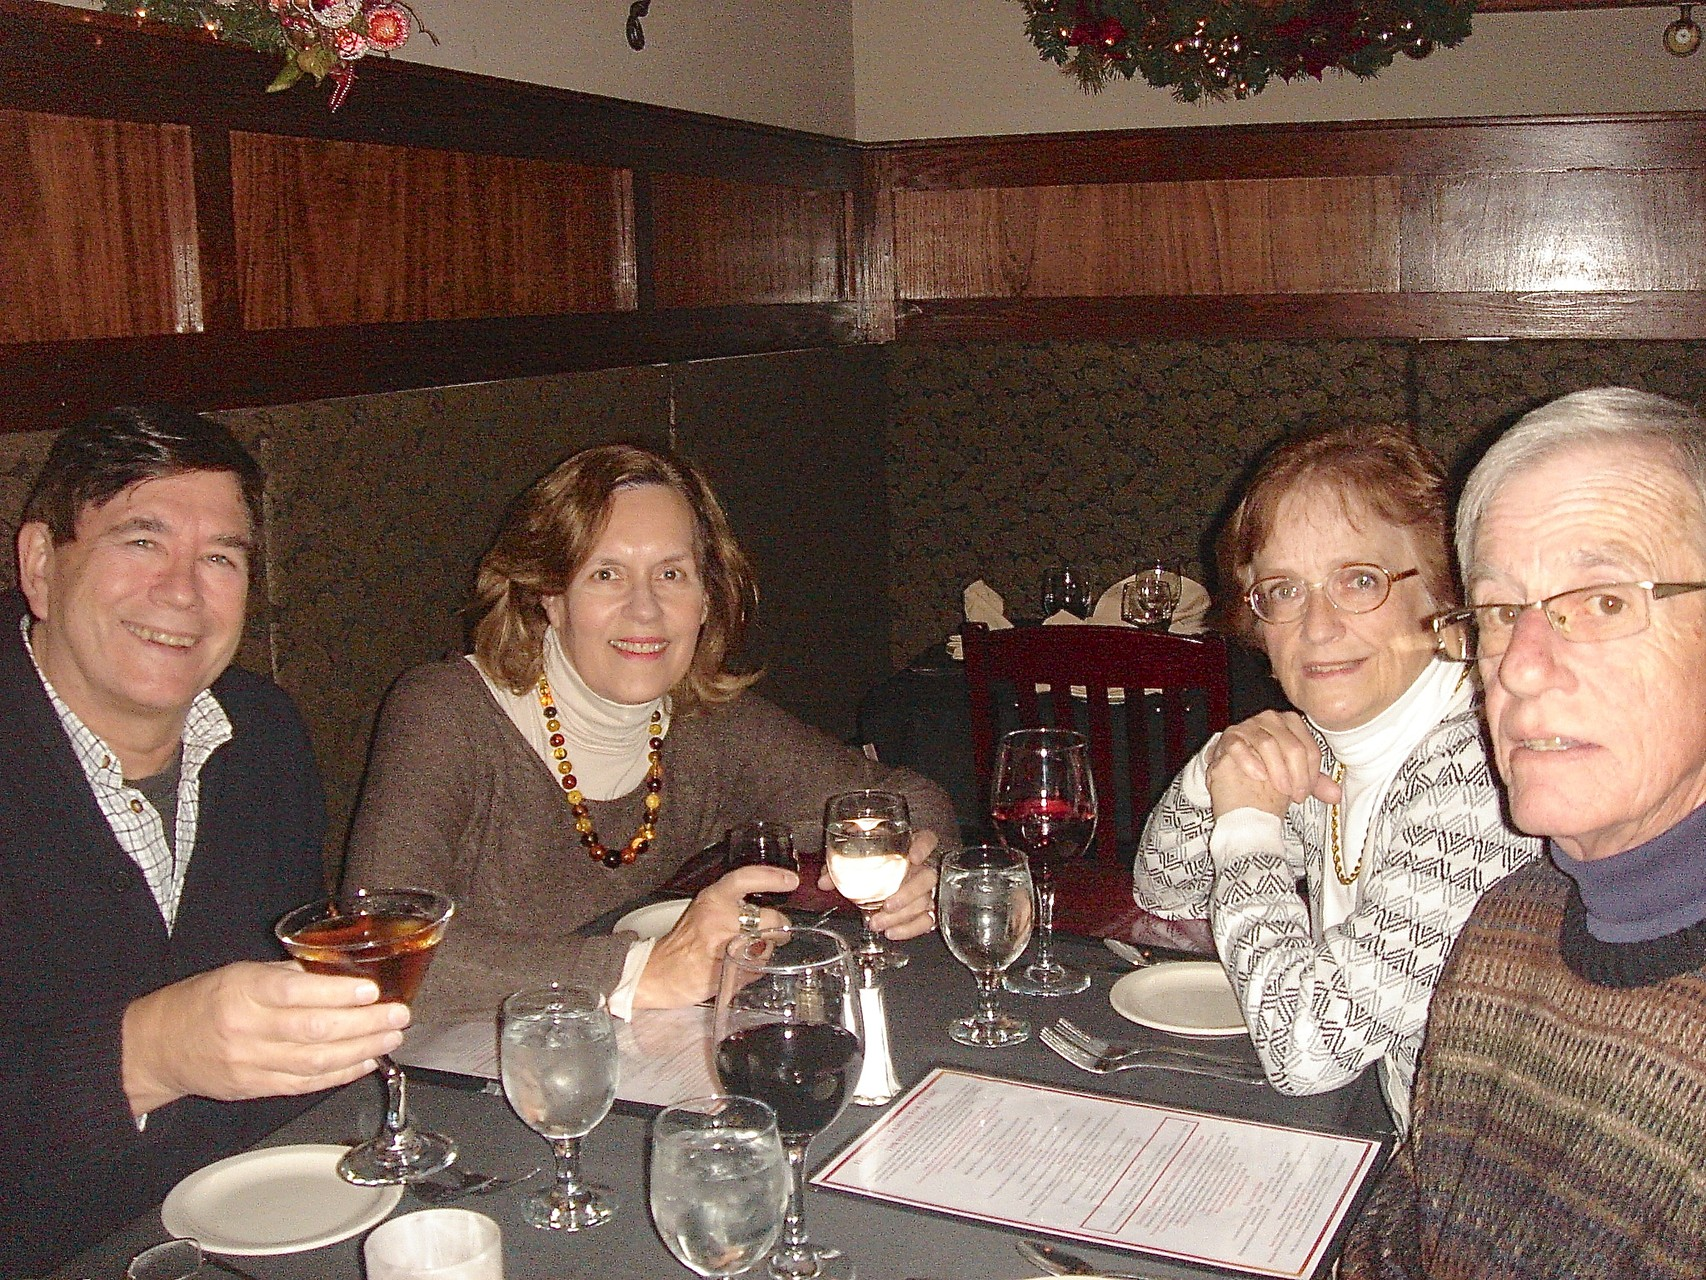 John, Lorraine, Jeanne, & John Sheridan at Daniella's Steakhouse, Syracuse, NY